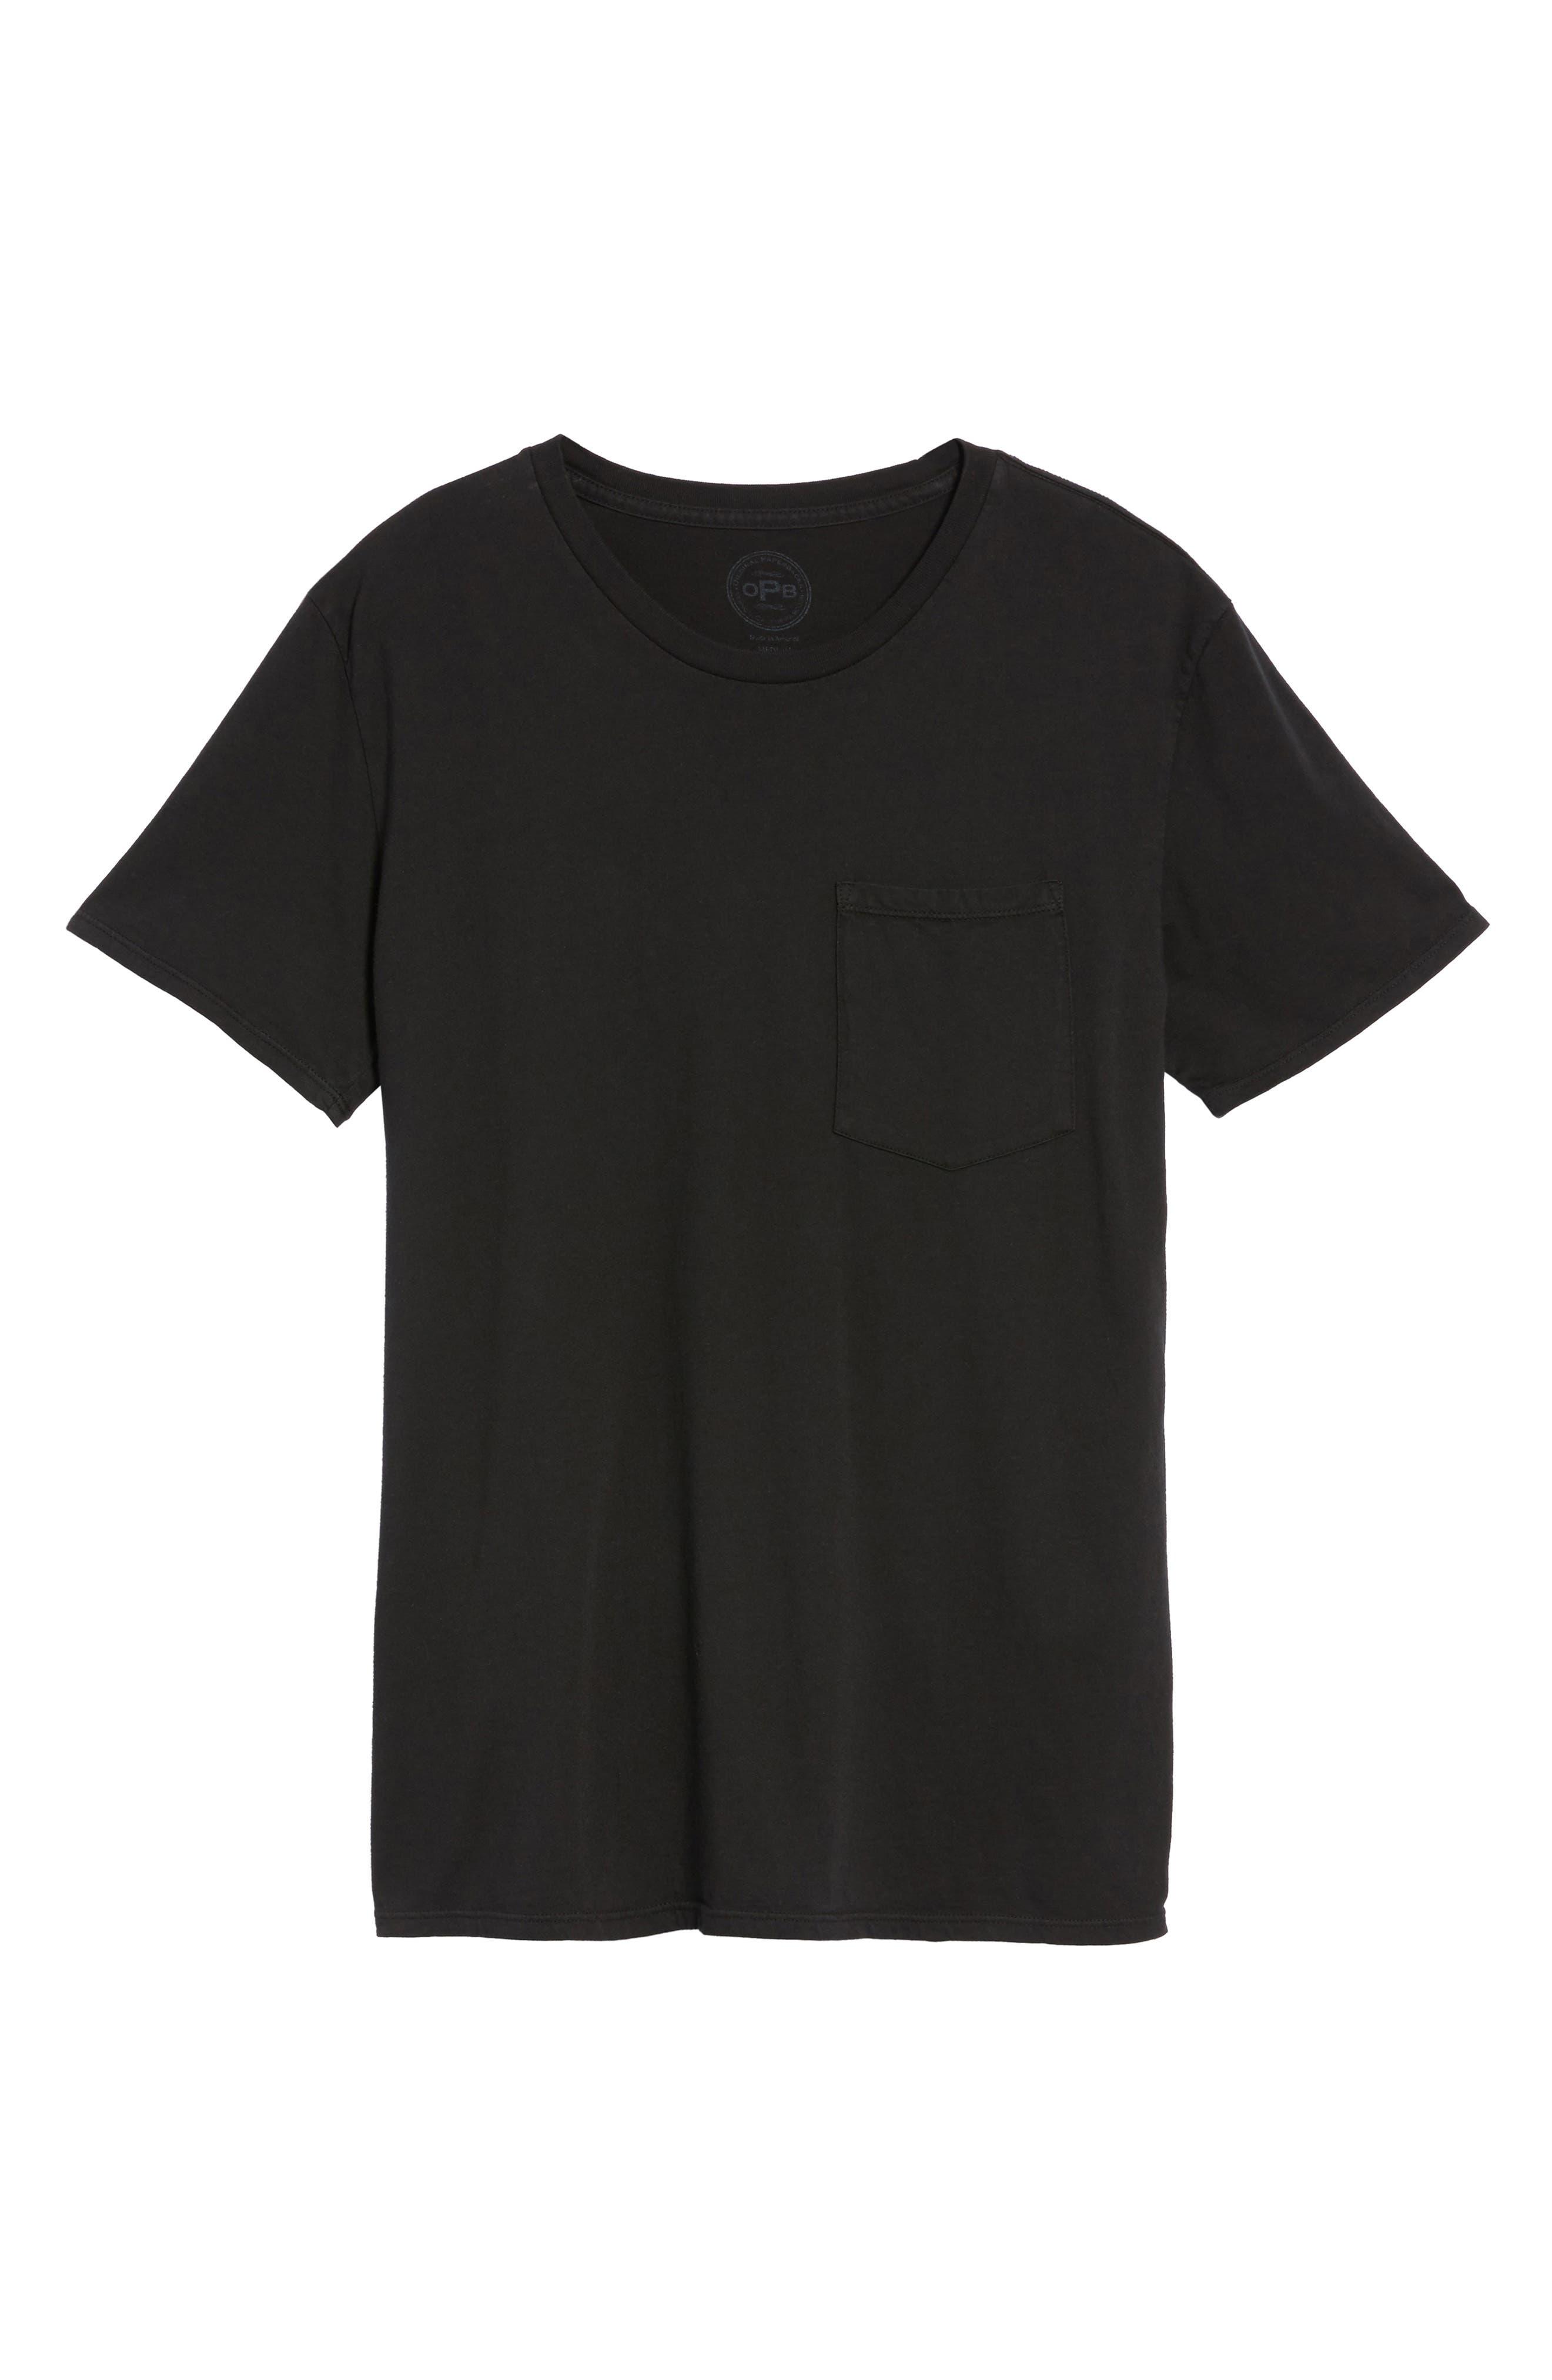 ORIGINAL PAPERBACKS,                             Pocket T-Shirt,                             Alternate thumbnail 6, color,                             001